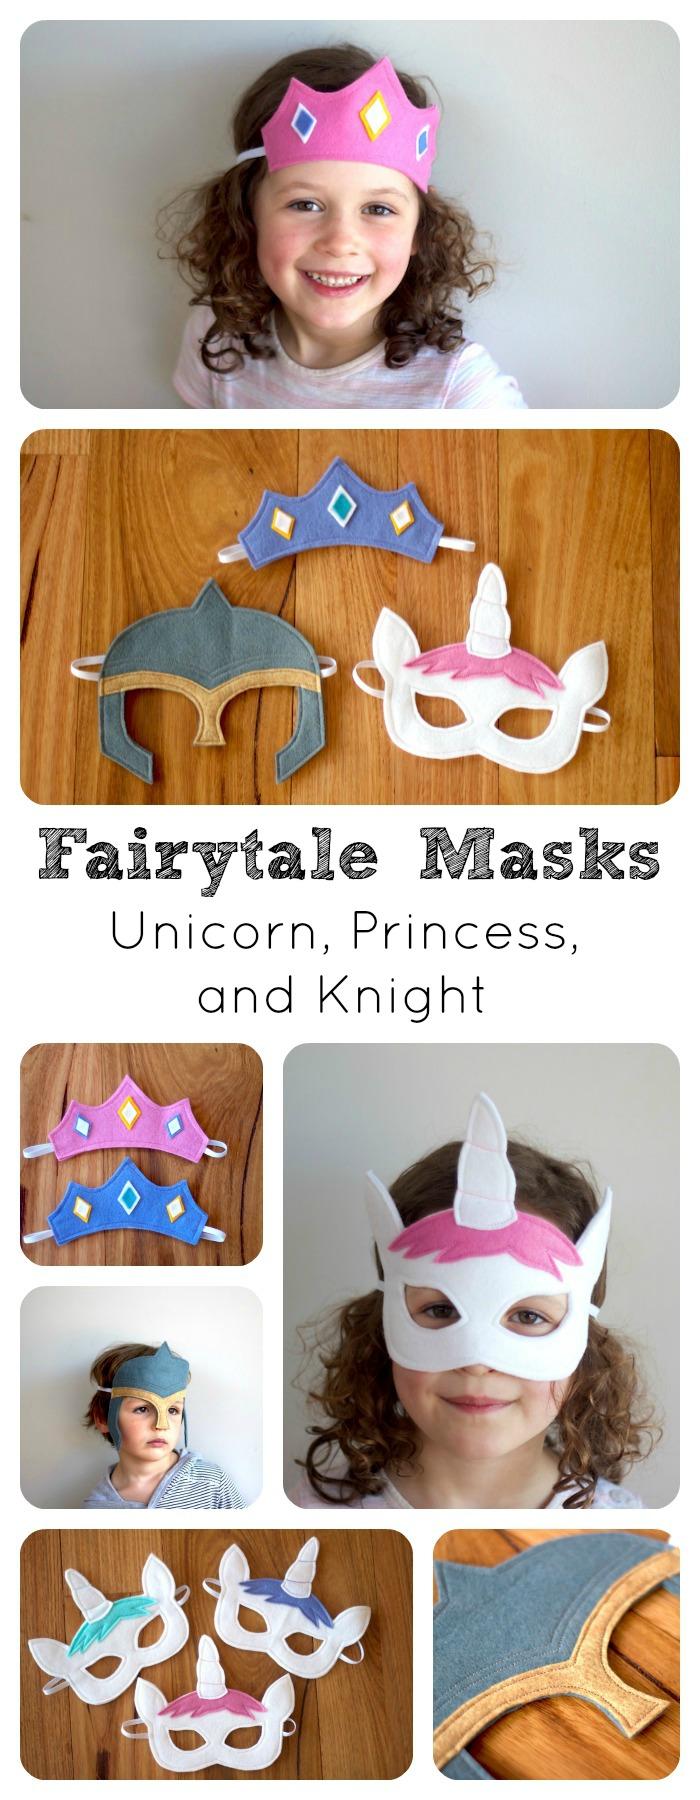 Fairytale Masks w text for Pinterest.jpg